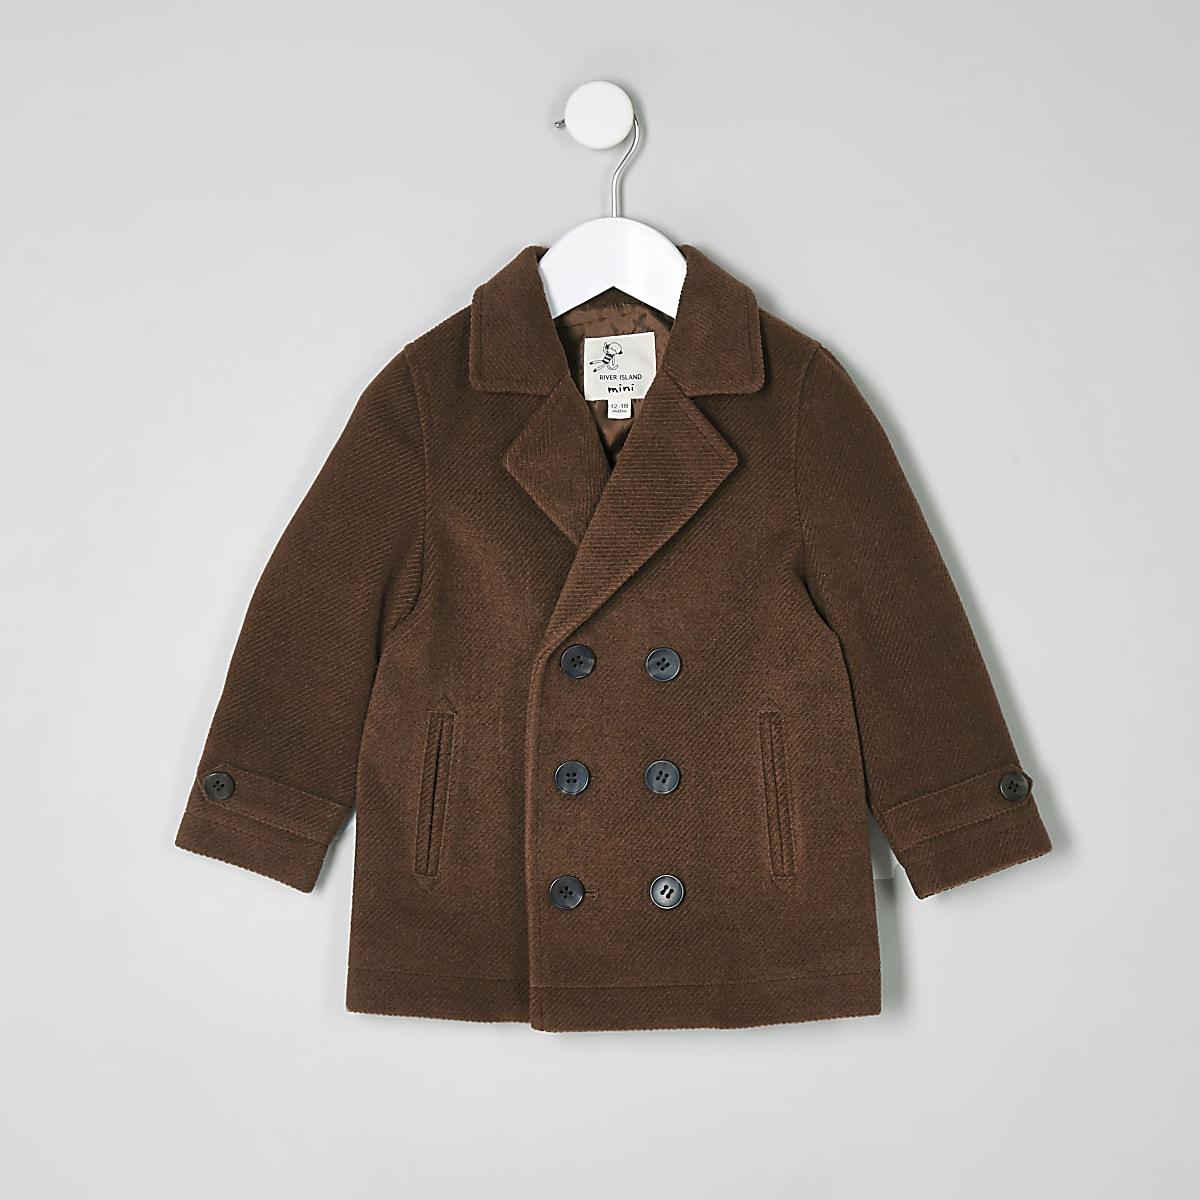 0e77bf11a Mini boys brown pea coat - Baby Boys Coats & Jackets - Mini Boys - boys